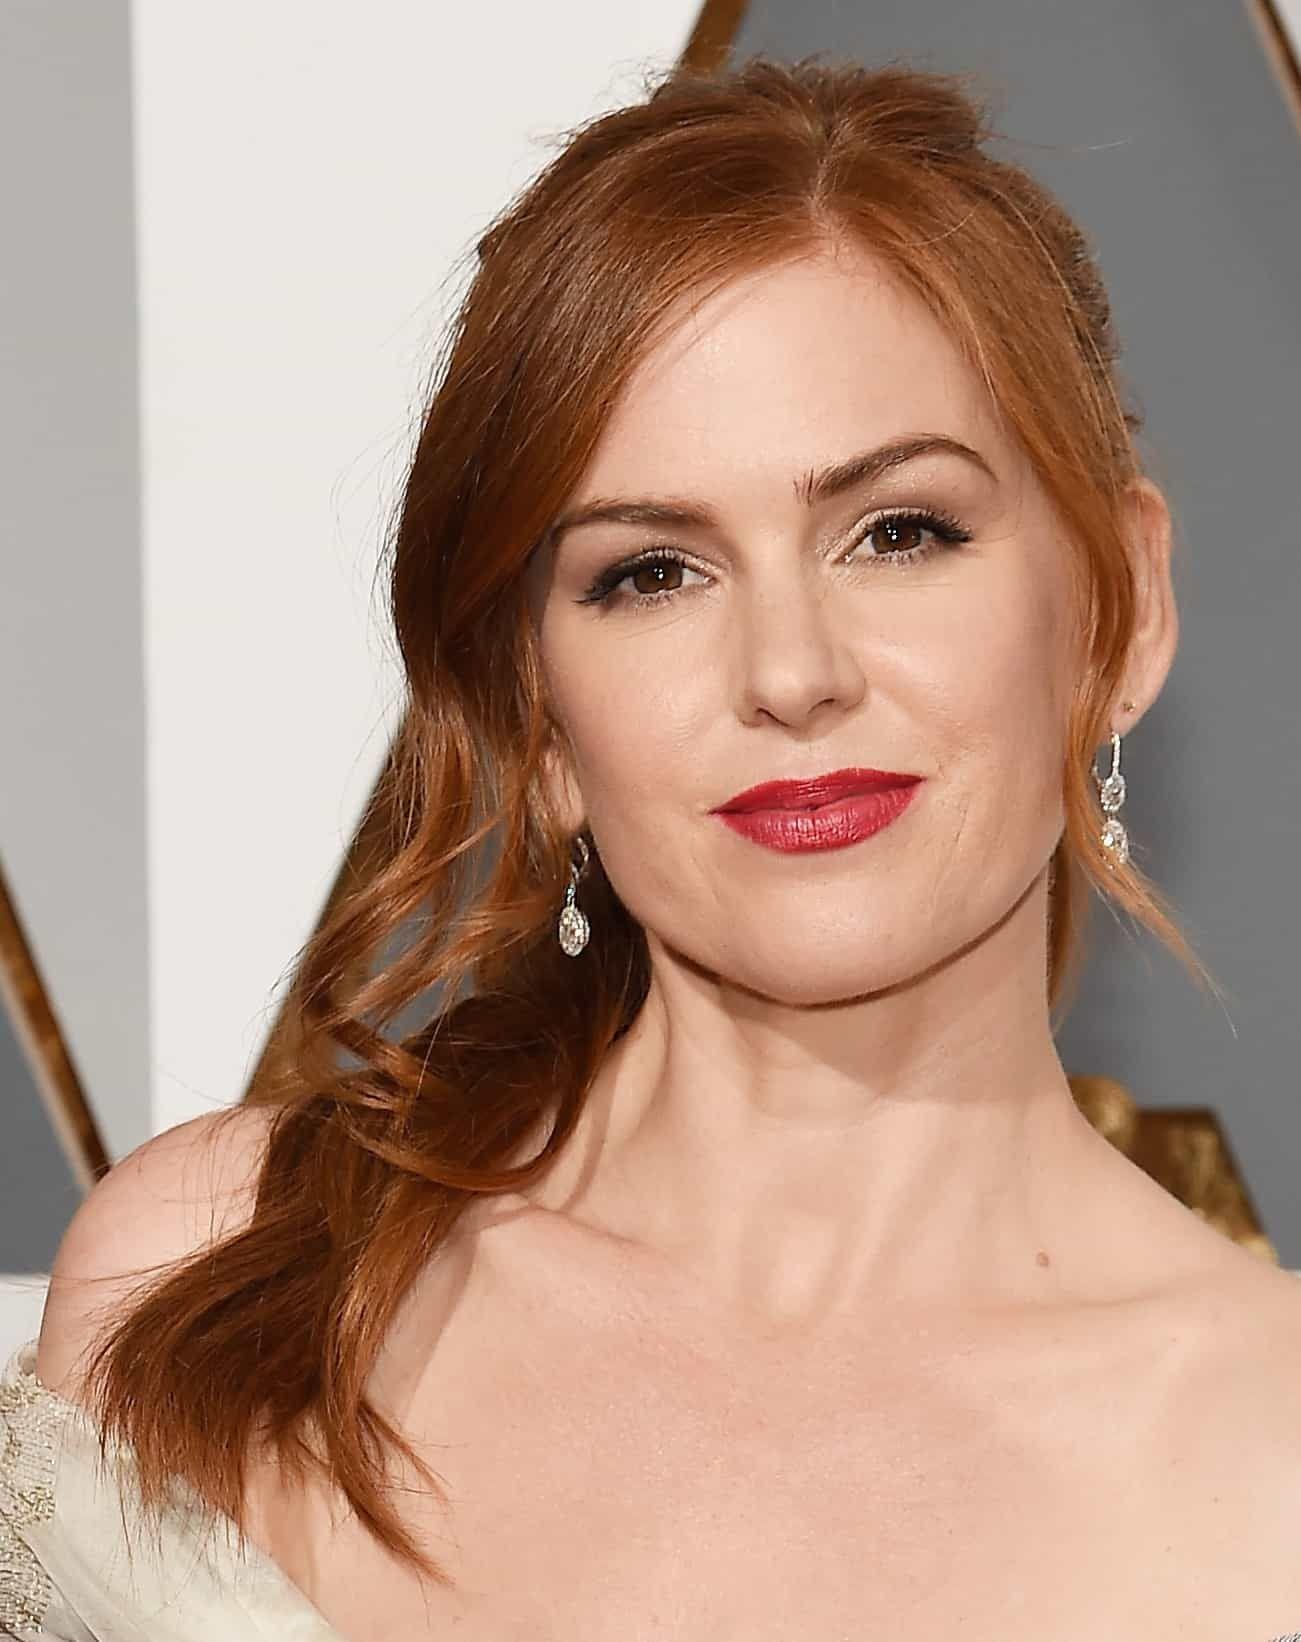 Best 'Redhead Friendly' Eyeshadows for Every Eye Color in